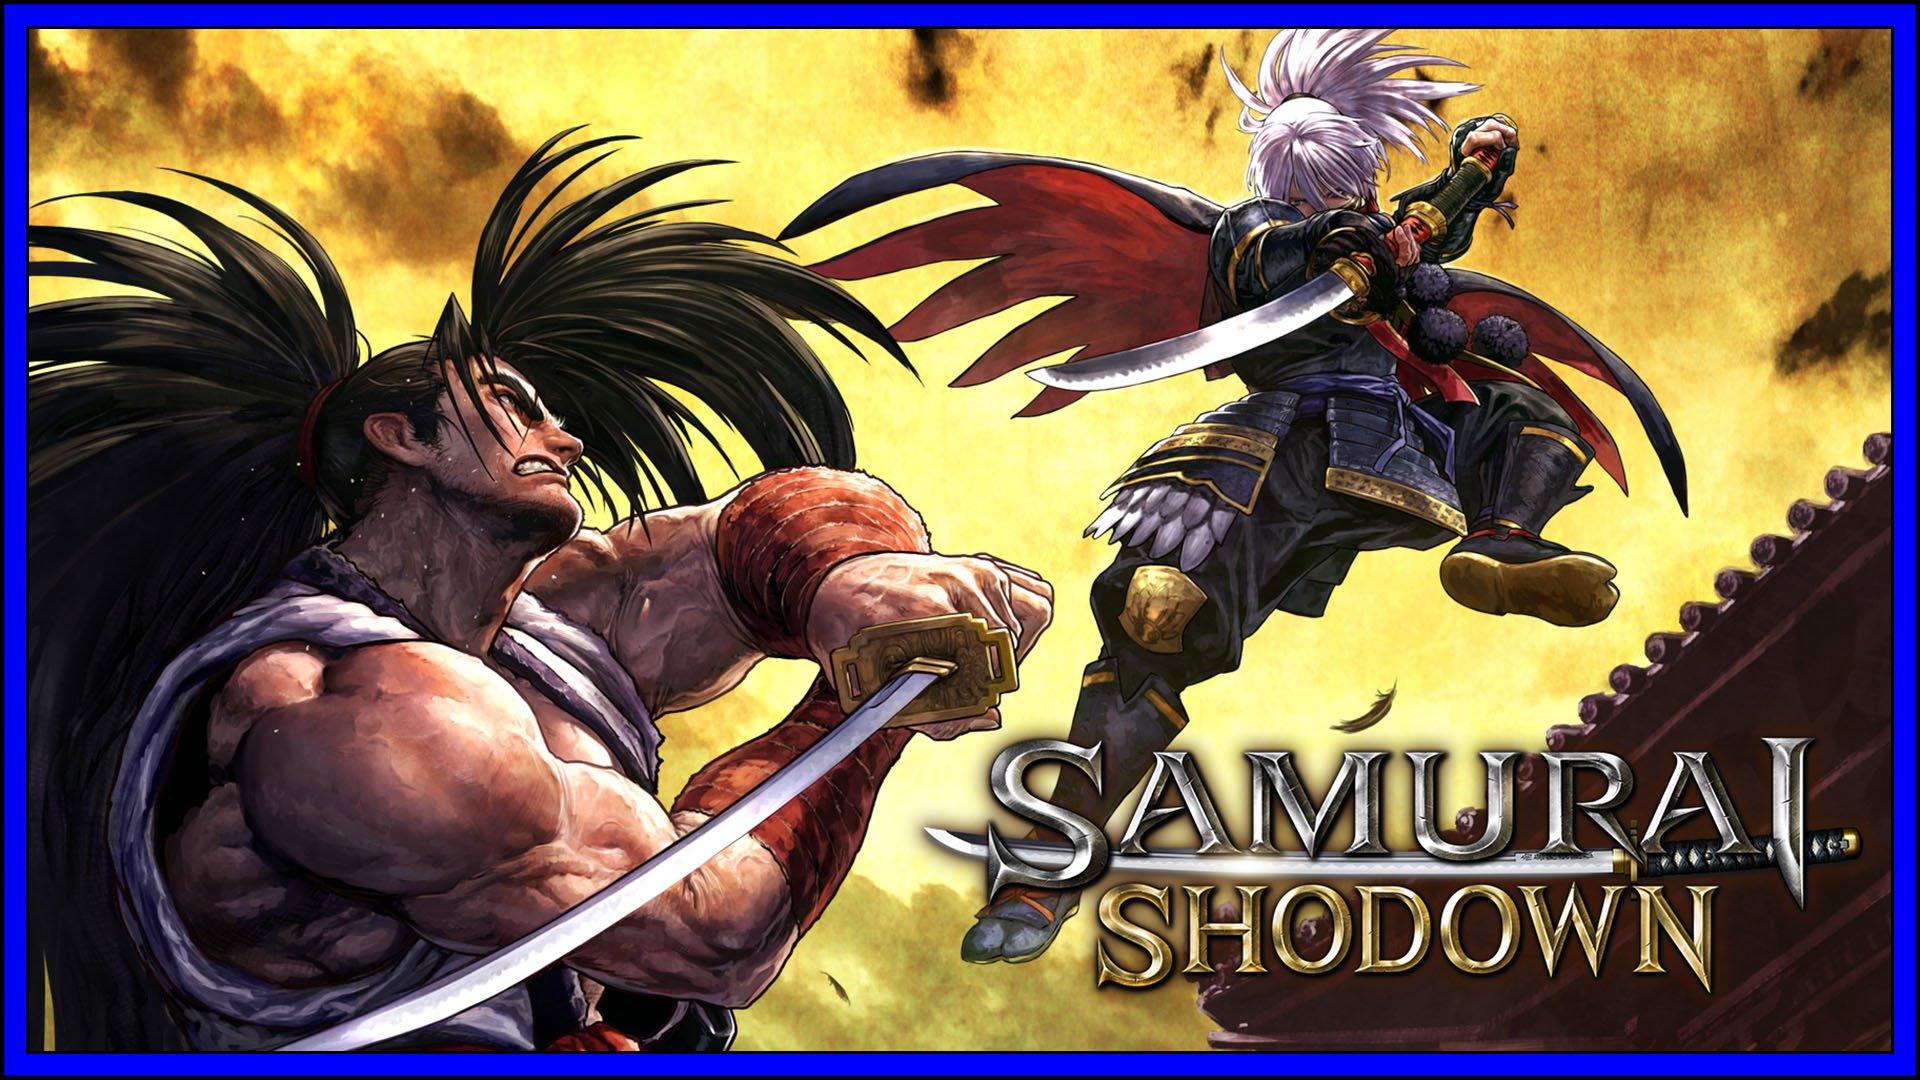 SAMURAI SHODOWN (PS4) Review